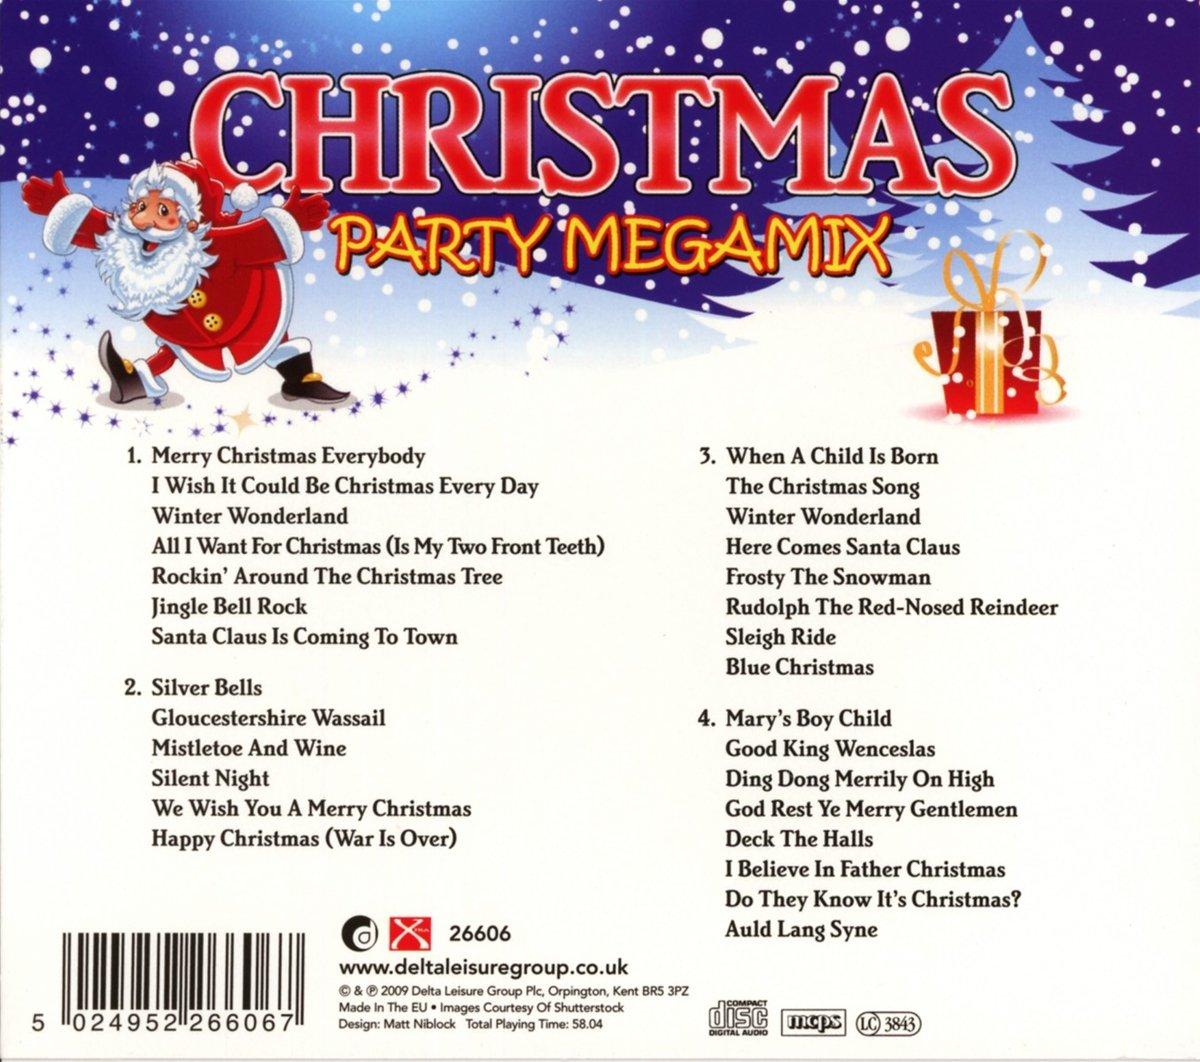 Christmas Party Megamix - Christmas Party Megamix - Amazon.com Music